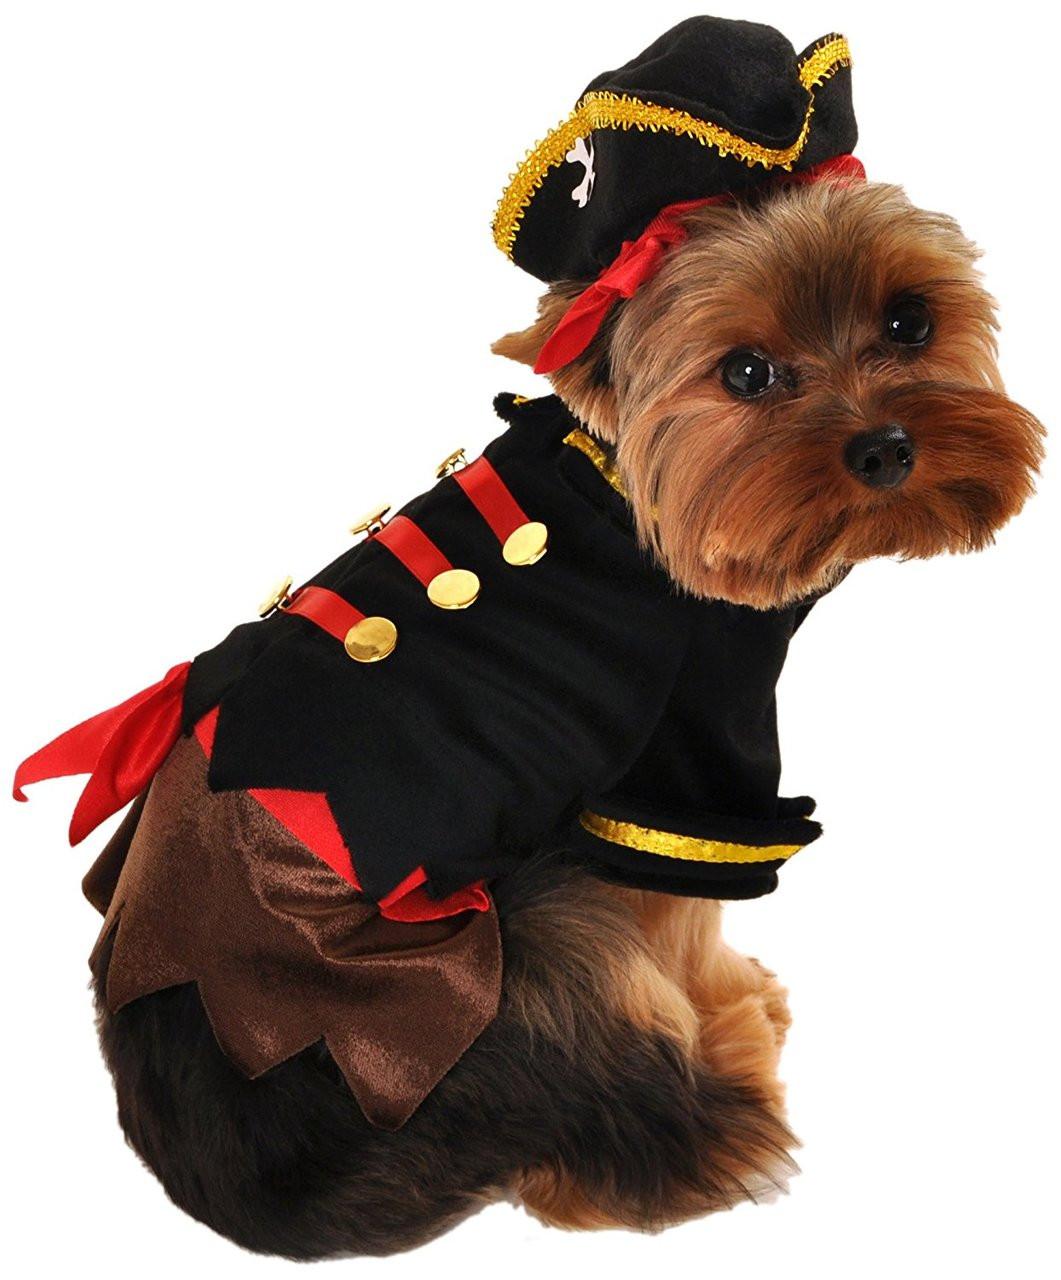 Buccaneer Pirate Dog Costume (LAST ONE!)  sc 1 st  FunnyFur & Pet Costumes u2013 Pet Costume Ideas For All Dogs | FunnyFur.com